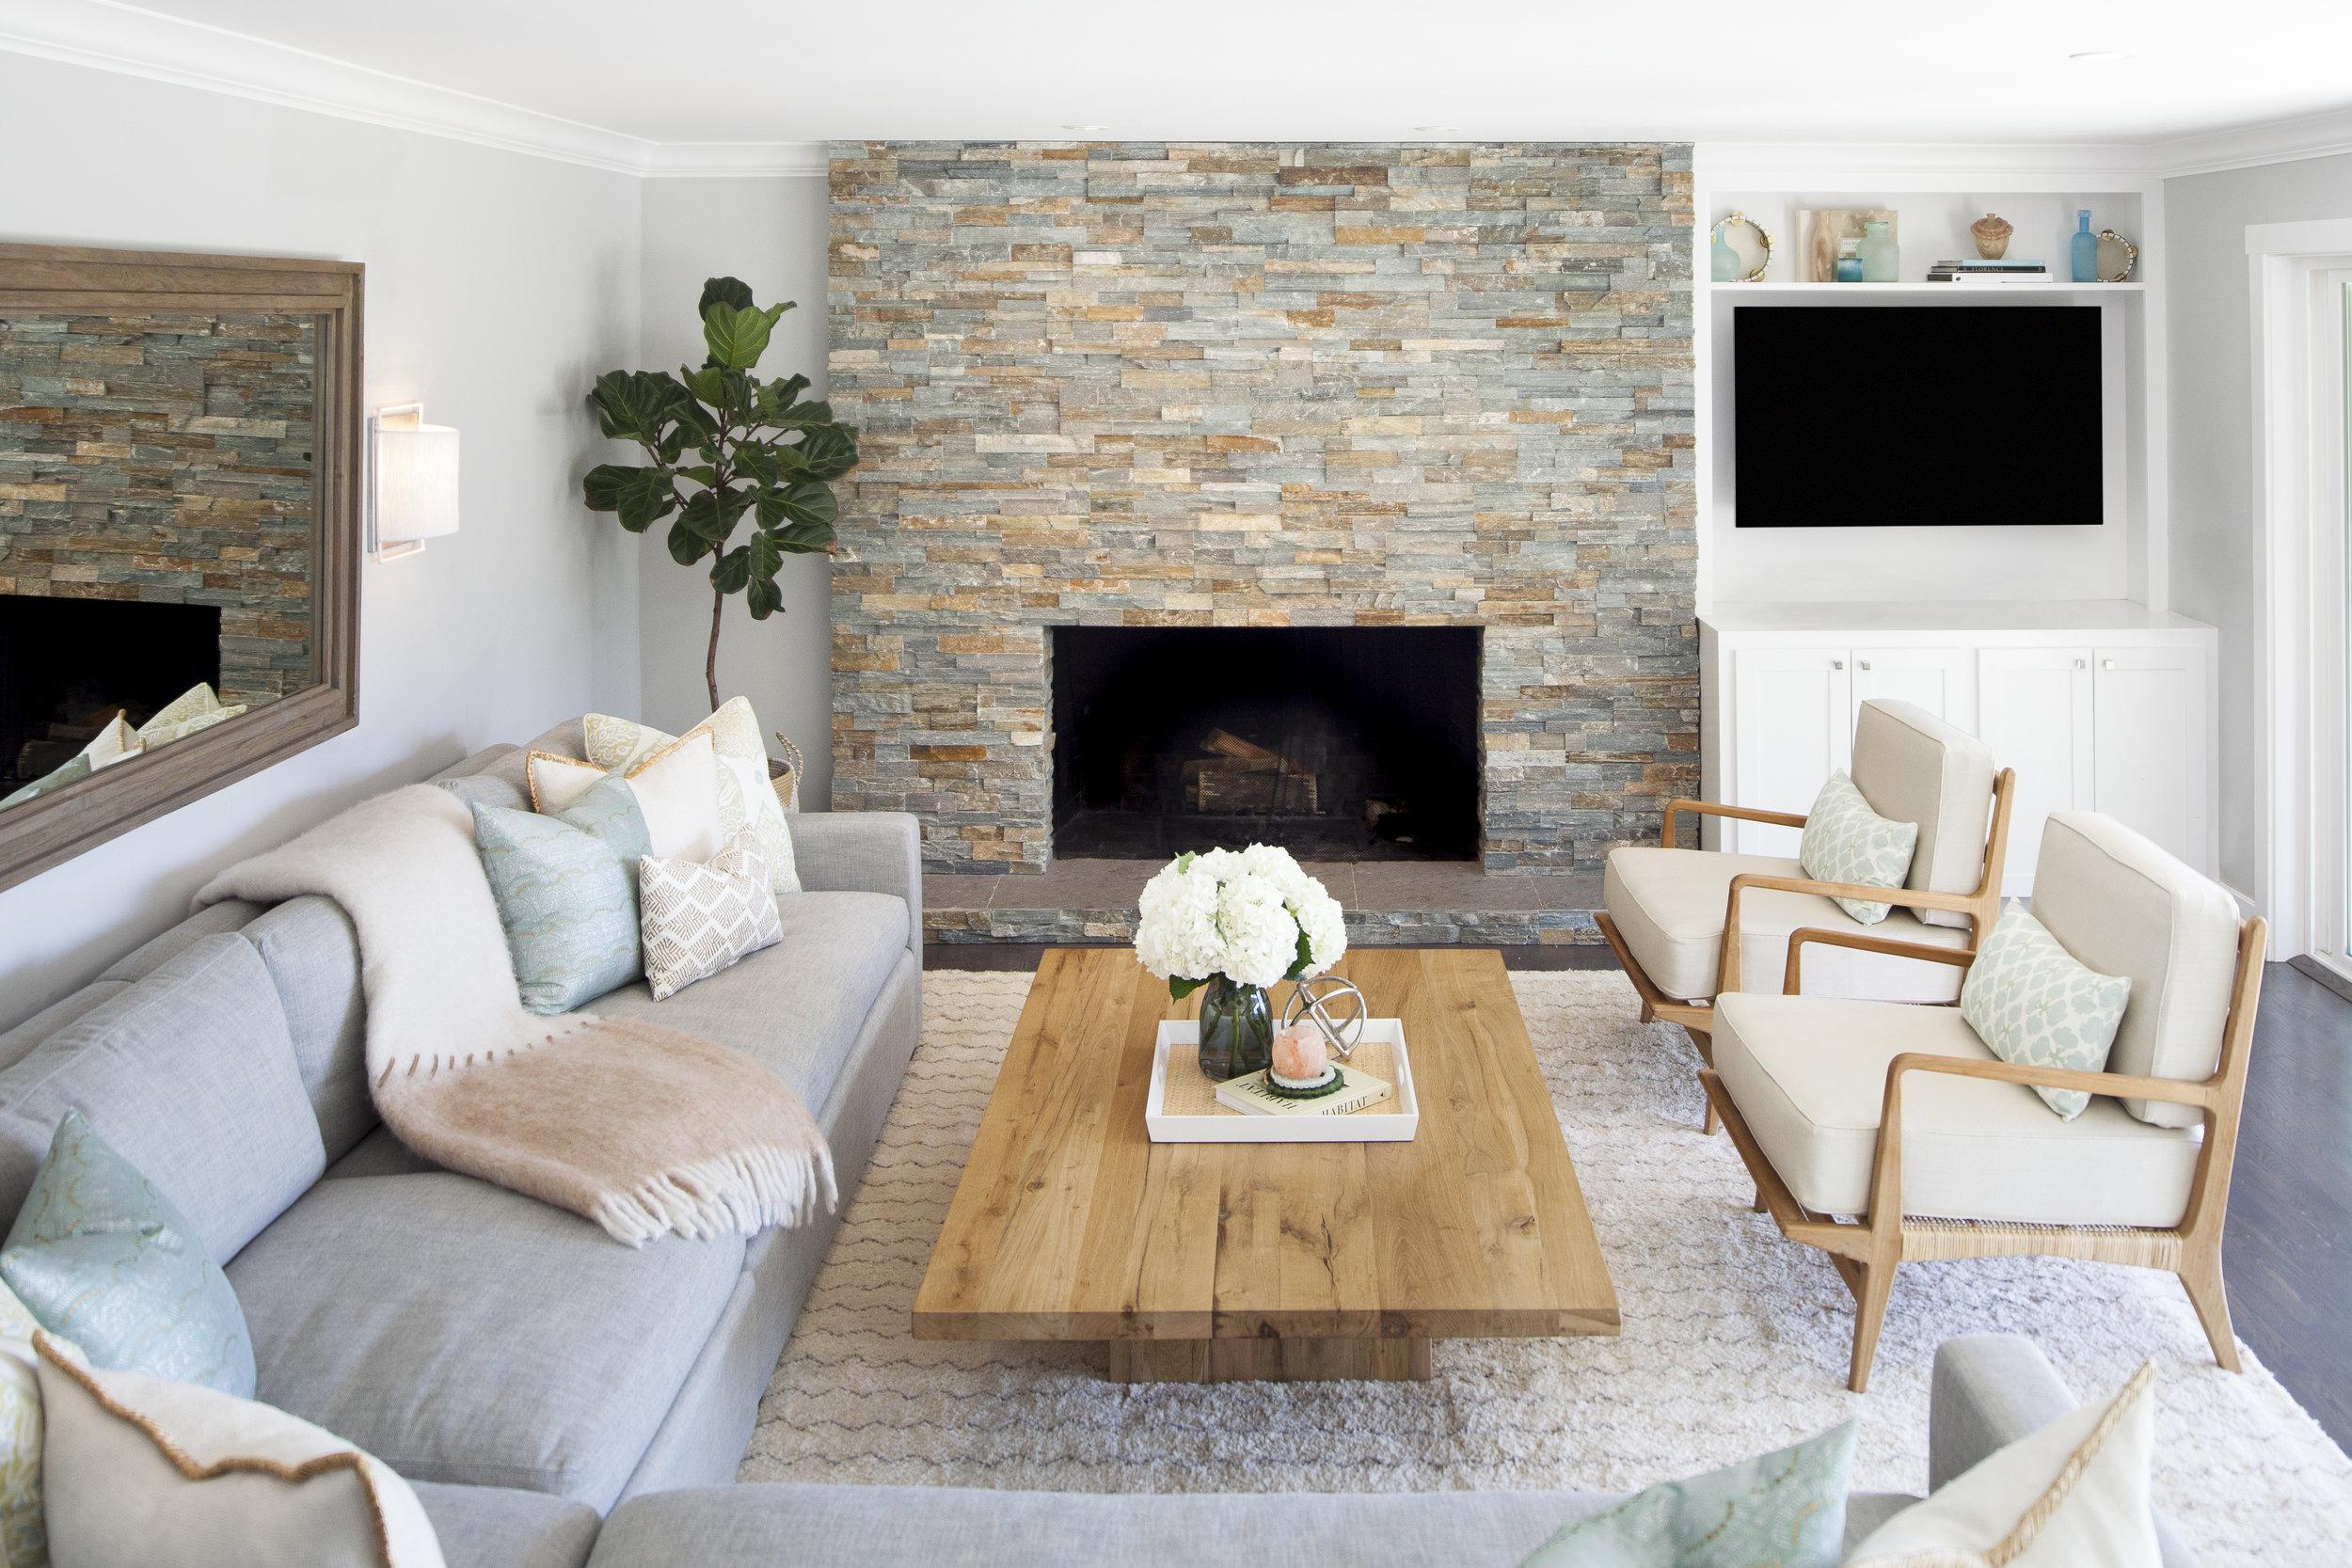 © Photo by Helen Ospina. Rachel Madden Interiors, Interior Designer in Marin County, CA